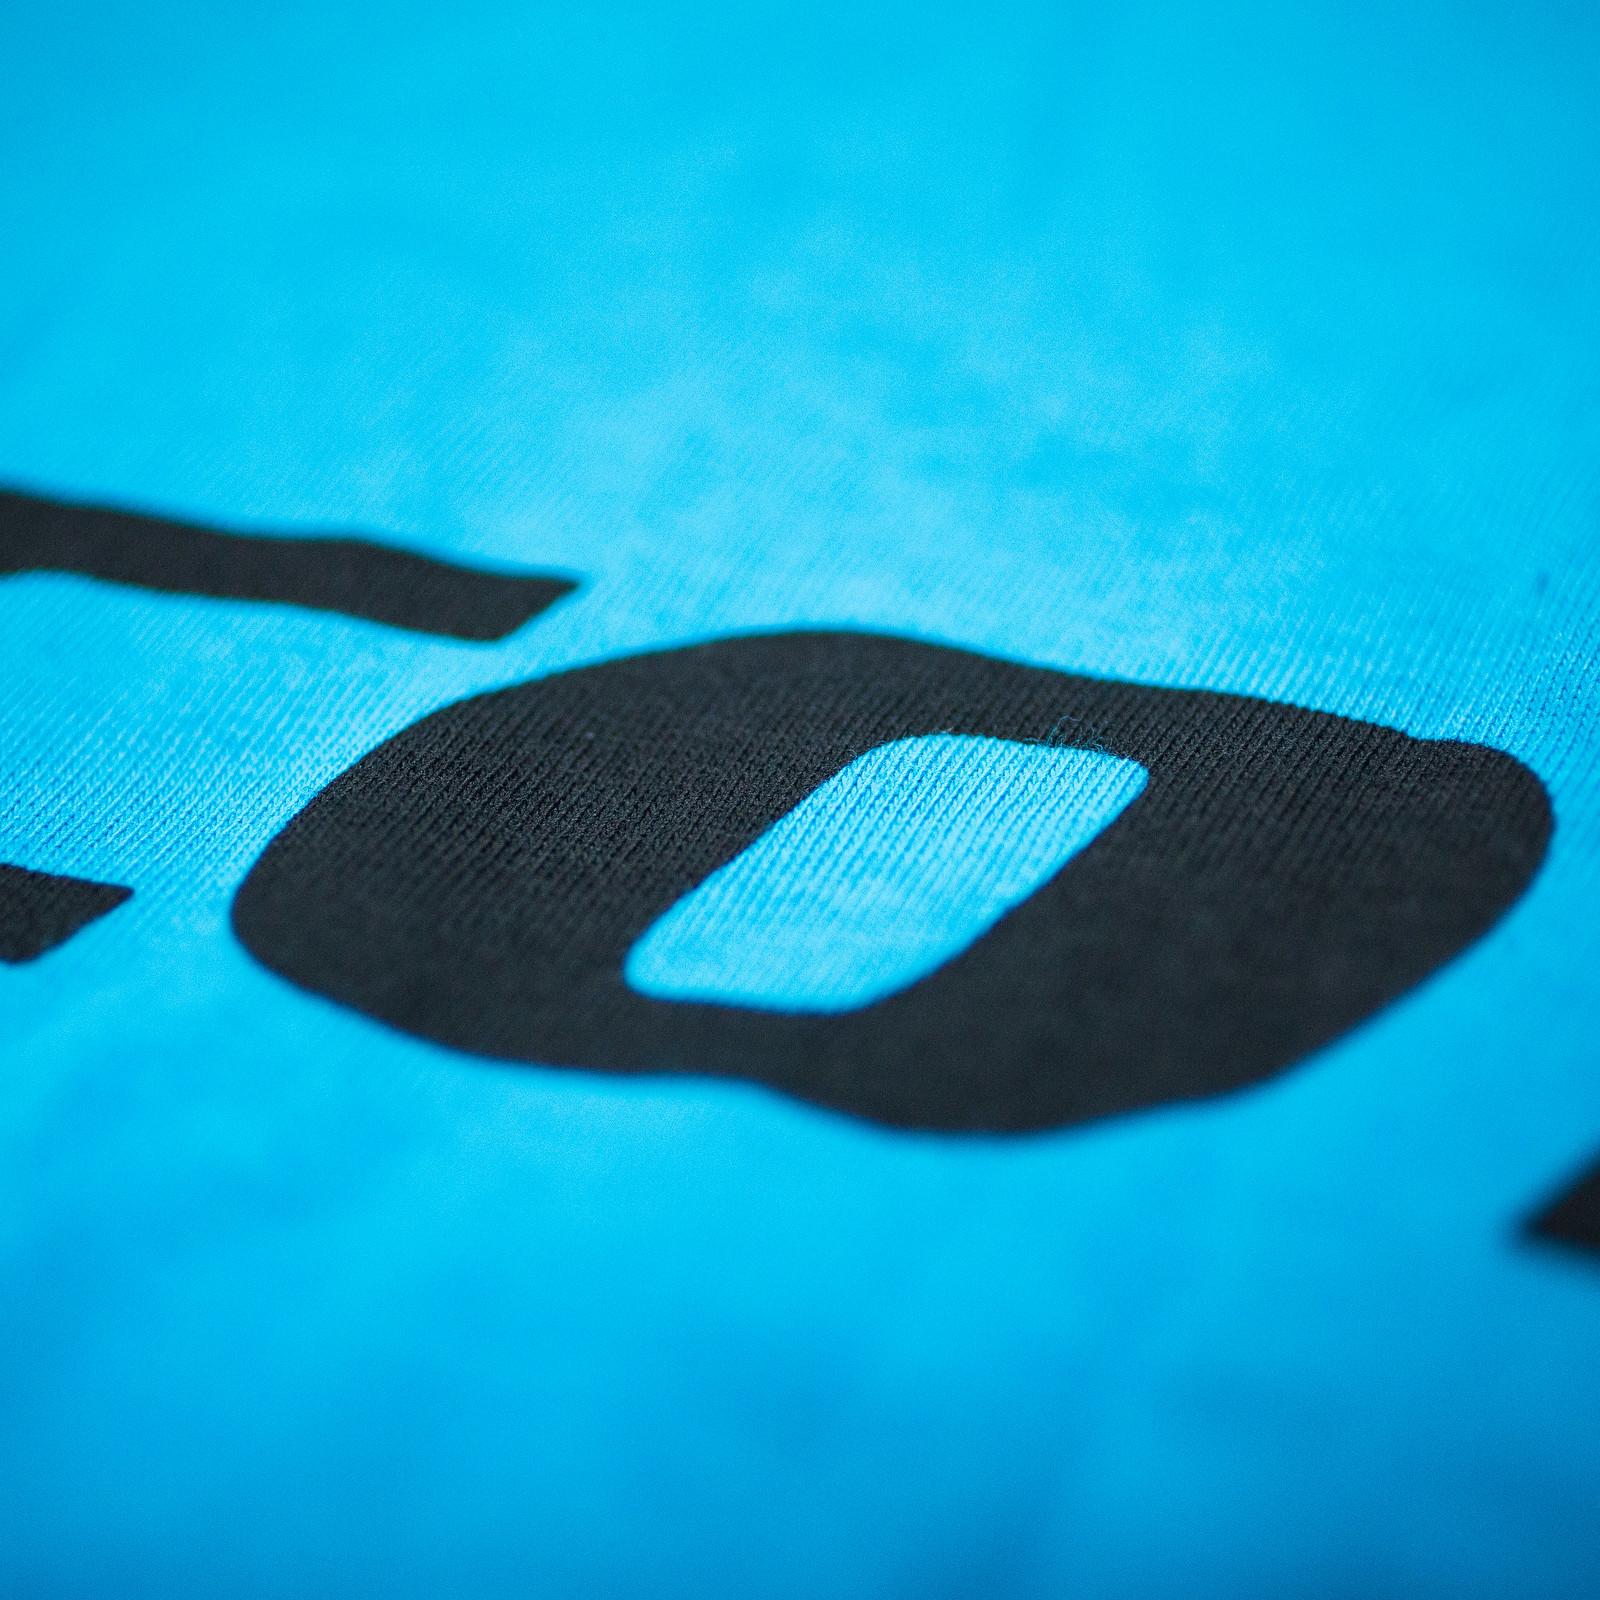 Process Blue T enduro, mountainbike, mountain bike, race, cycle, steel, steel full suspension, full suspension, uk, made in britain, made in the uk, hand made, handmade, sheffield, england, peak district, peaks, stell, coptic, coatic, steel is real, mountain, trail, adventure, escape, bike